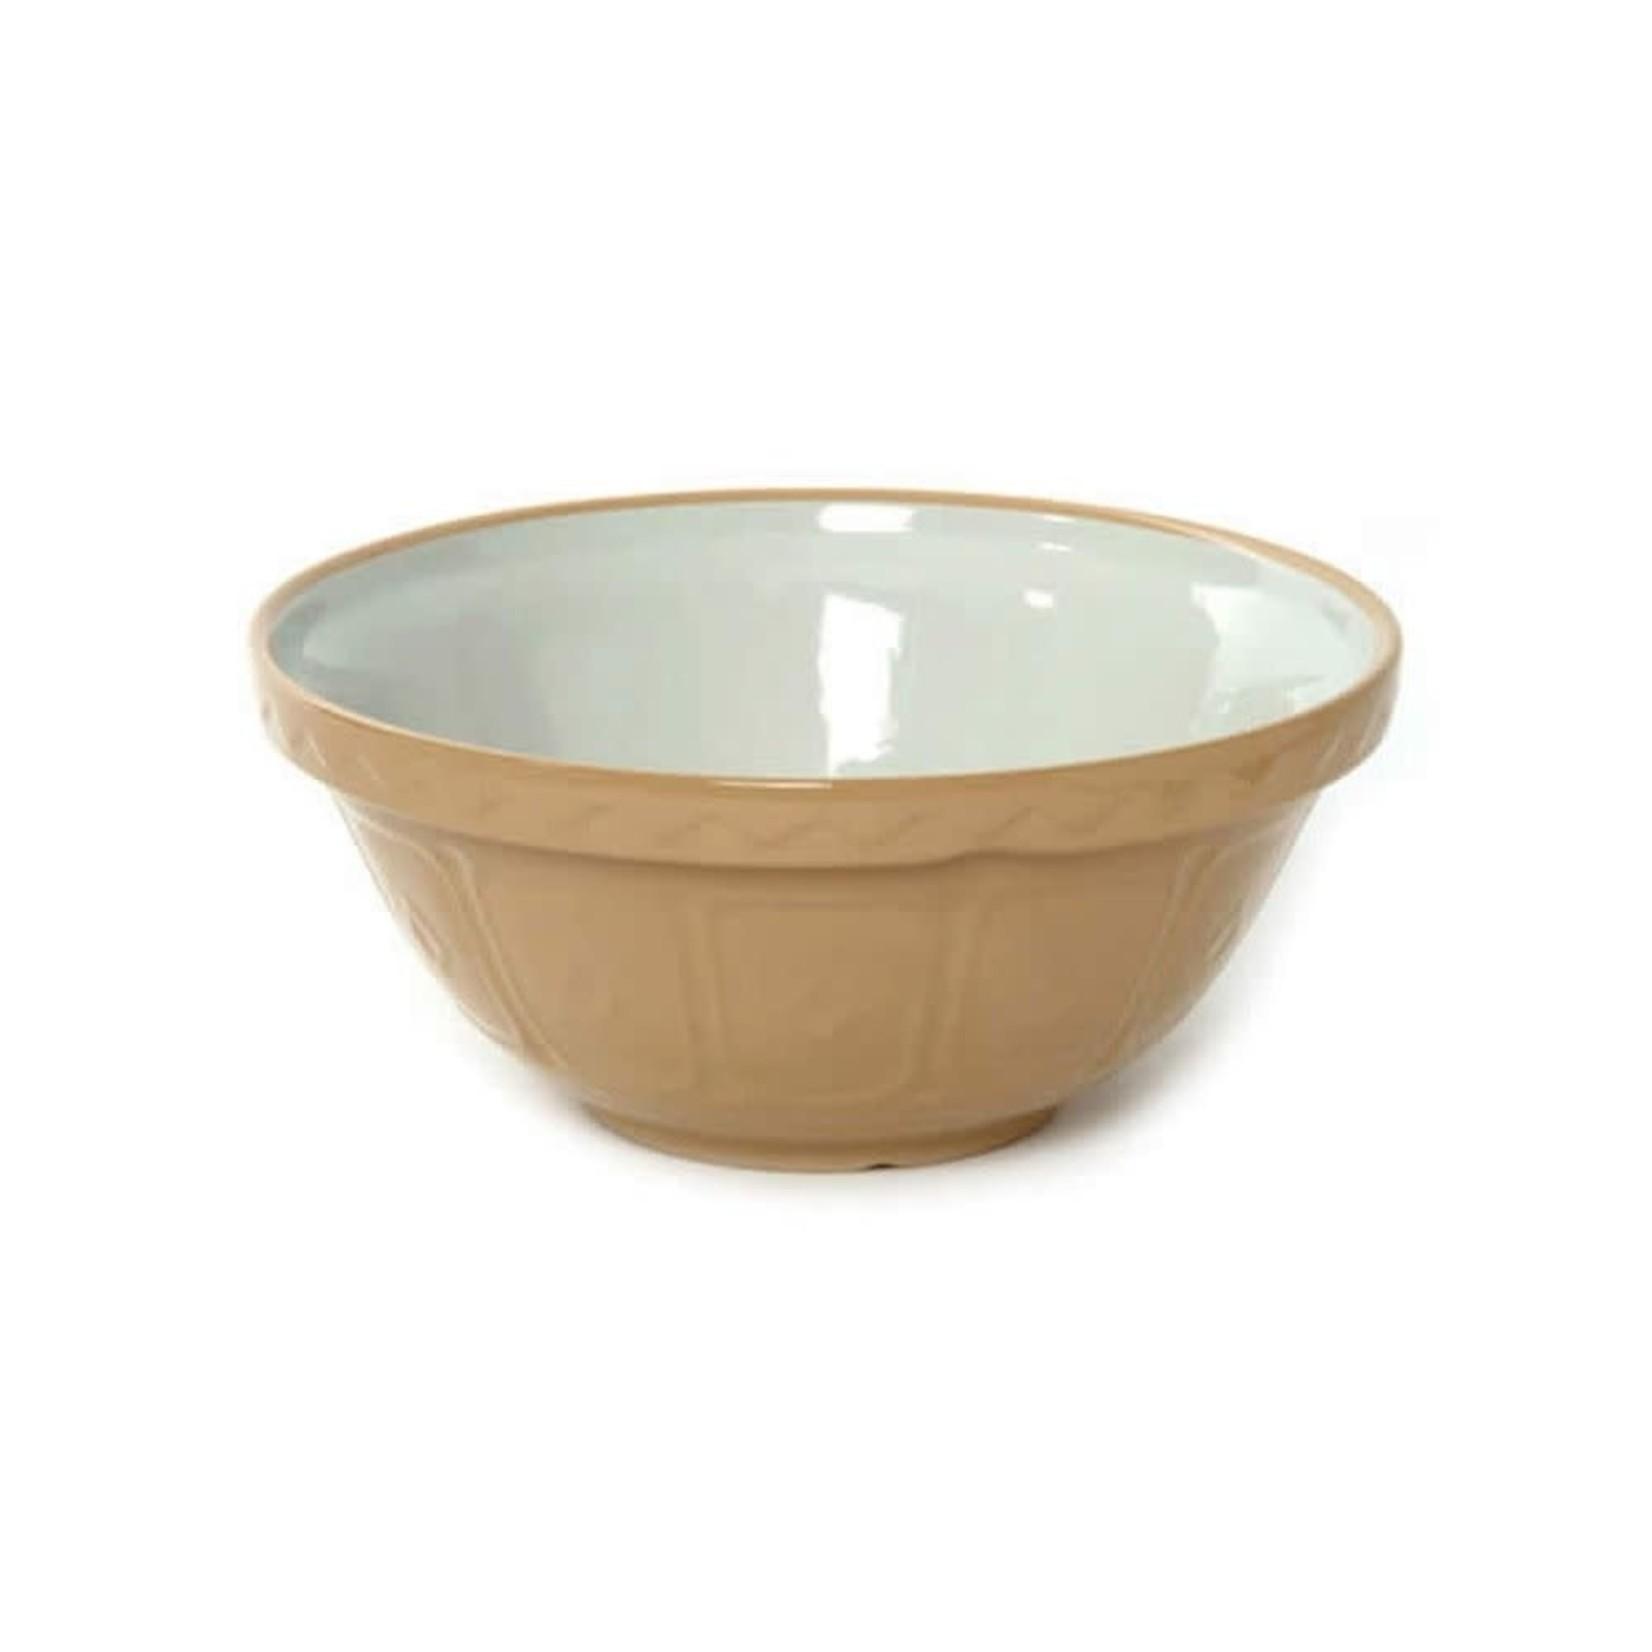 Caneware Mixing Bowl